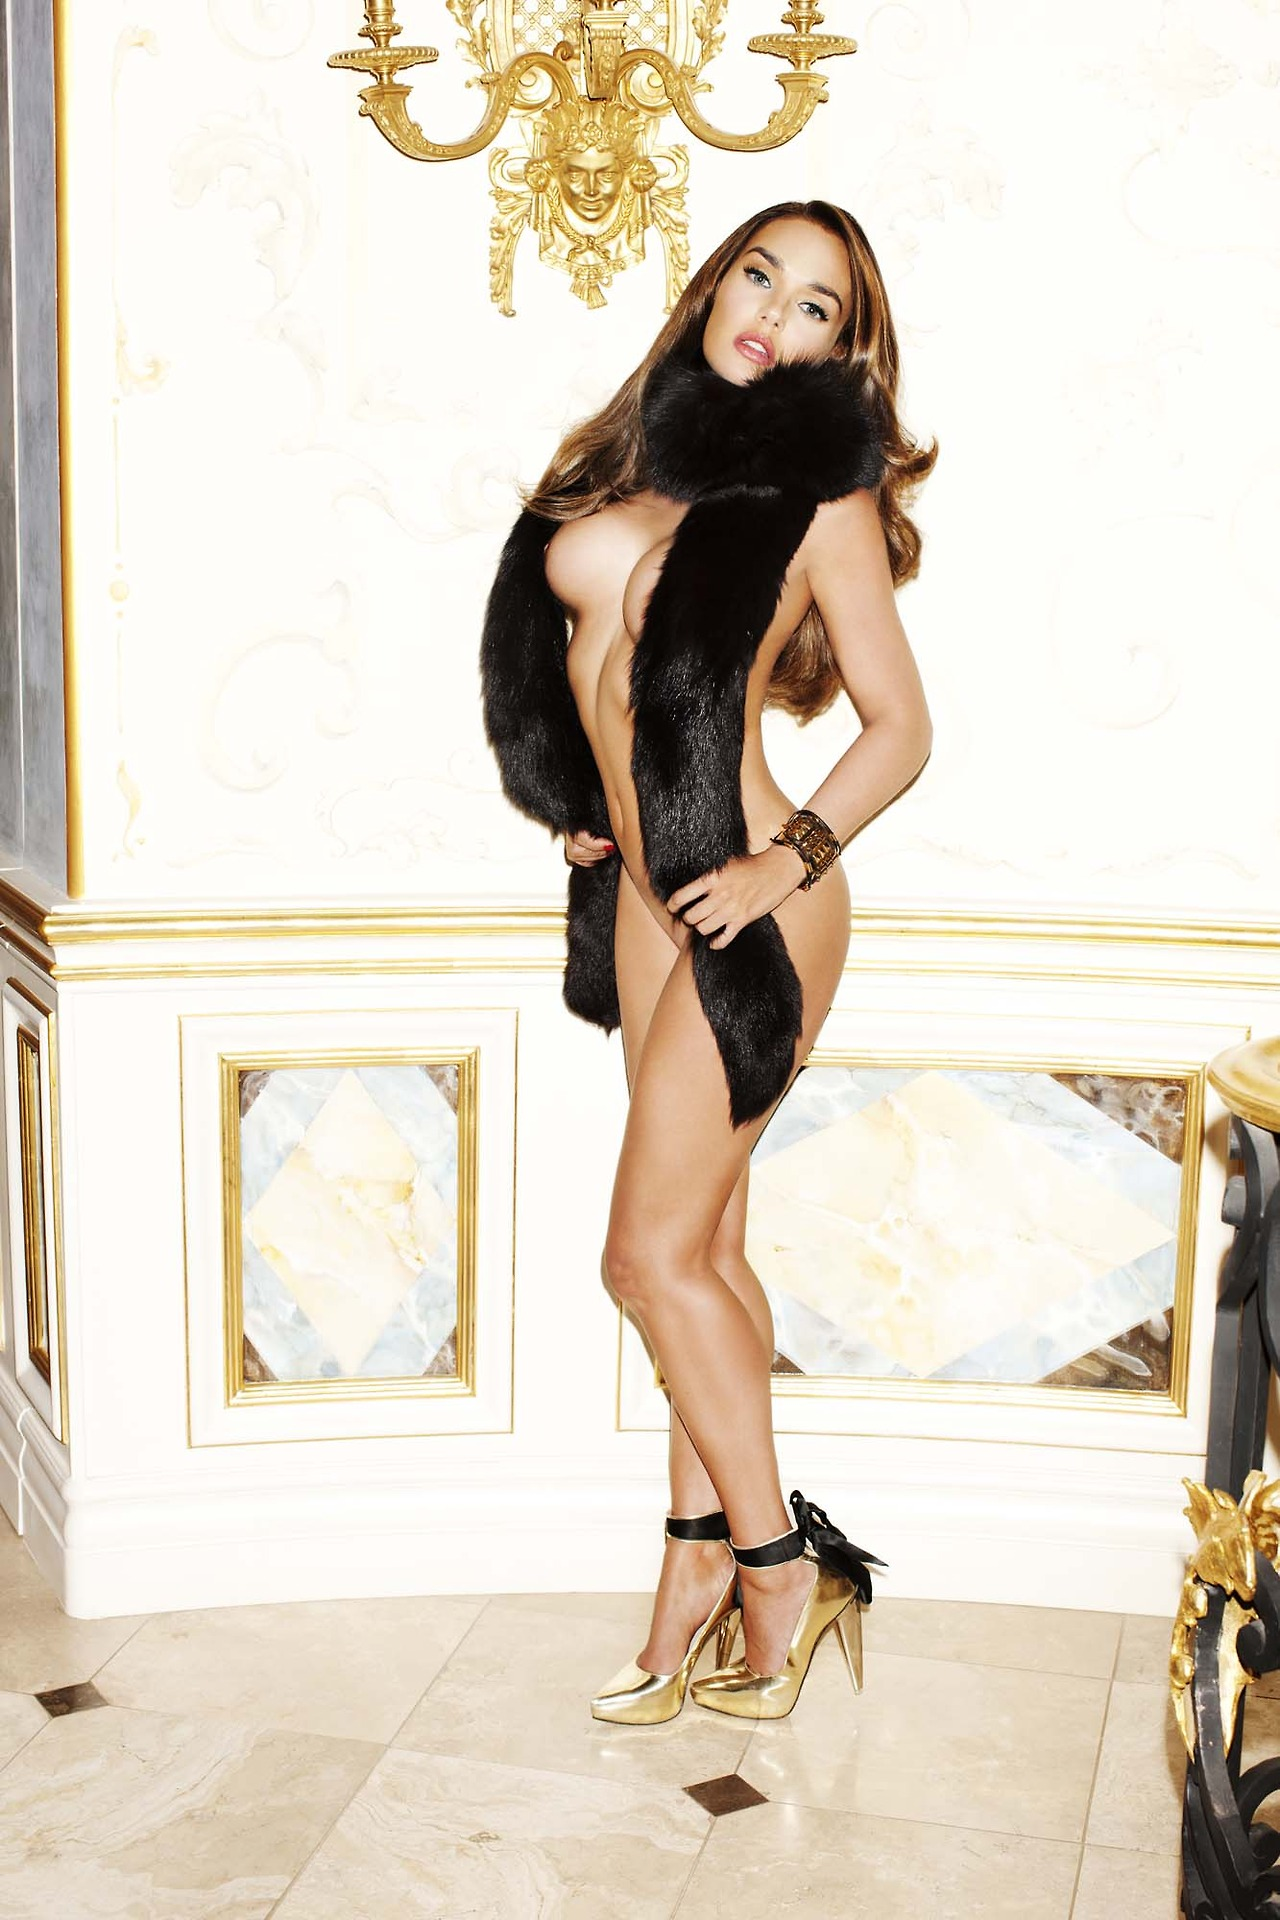 aria indian nude model